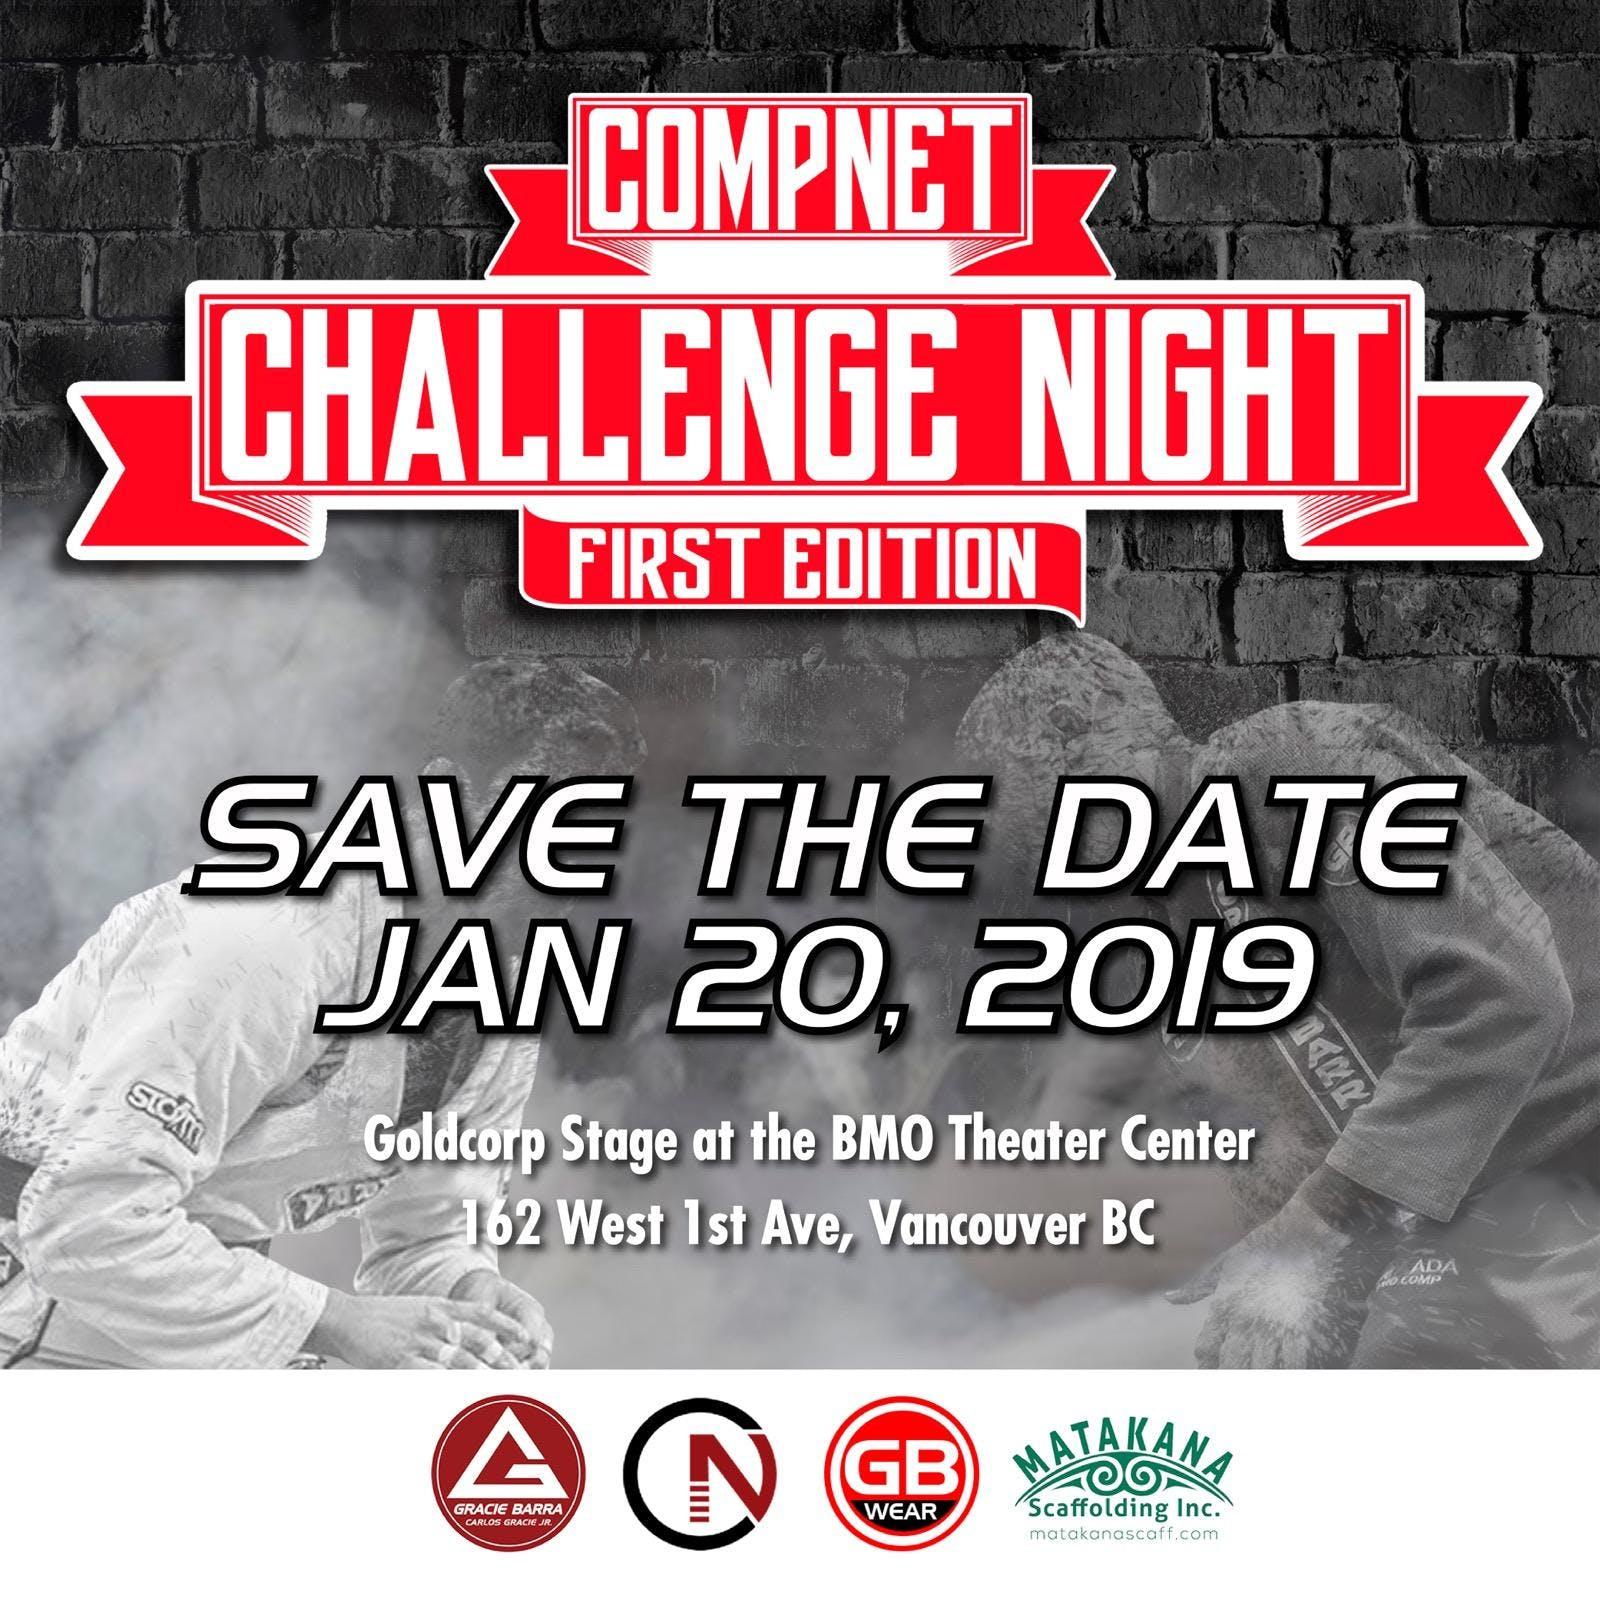 Compnet Challenge Night